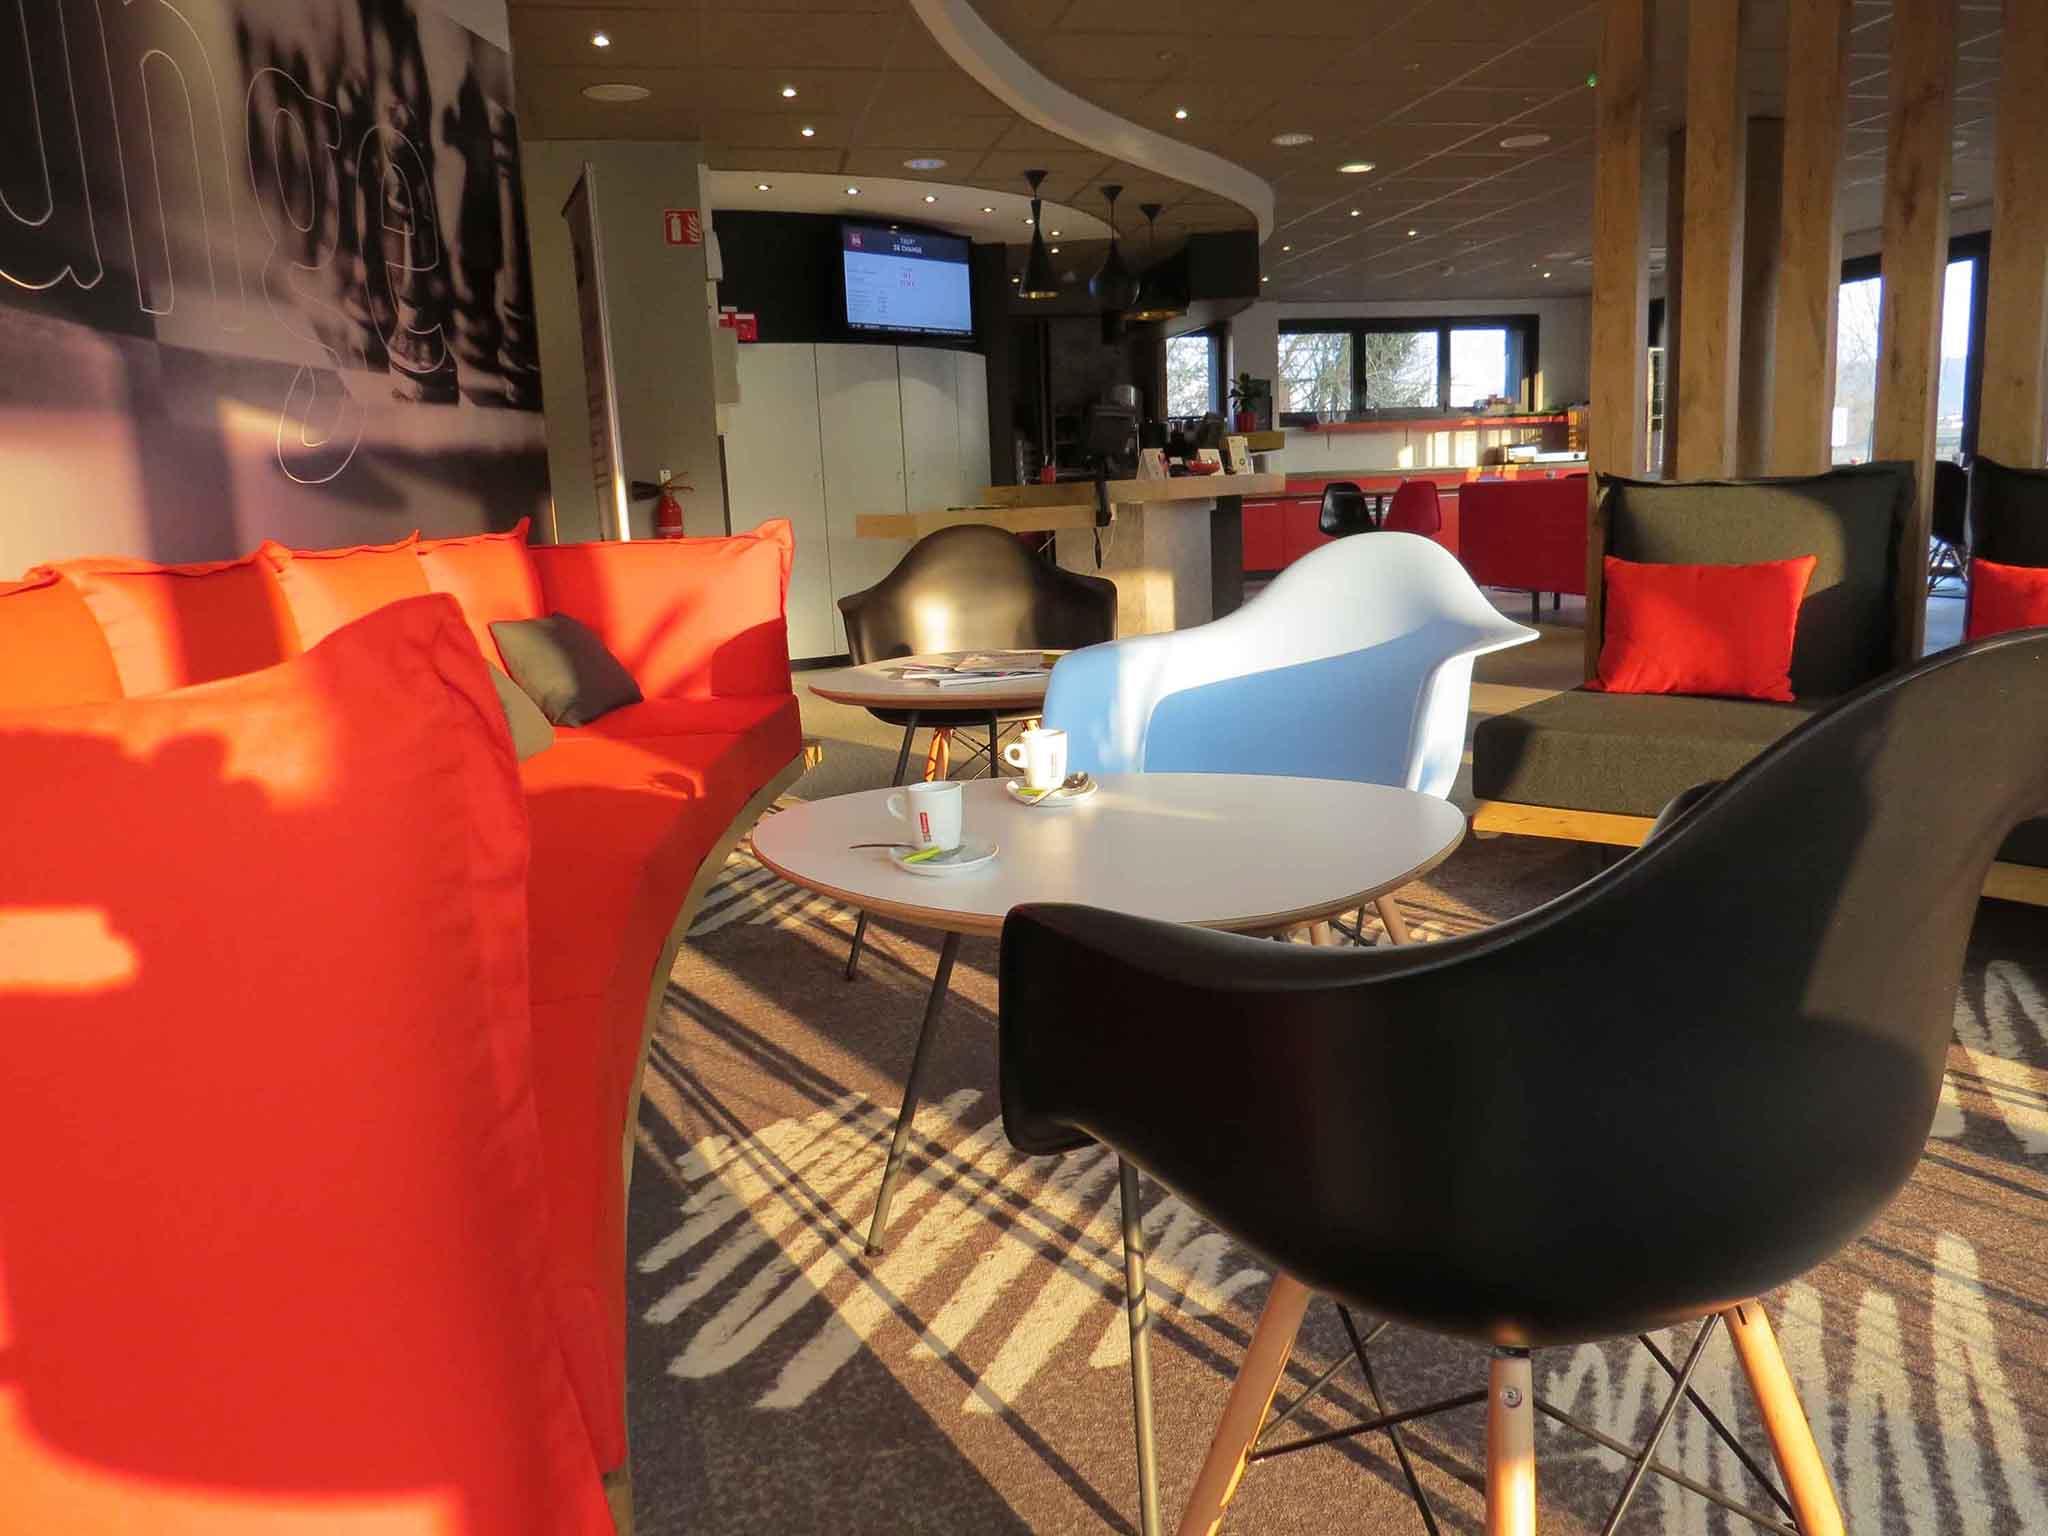 cora soisson latest valentin a pos une question cora soissons with cora soisson soissons with. Black Bedroom Furniture Sets. Home Design Ideas